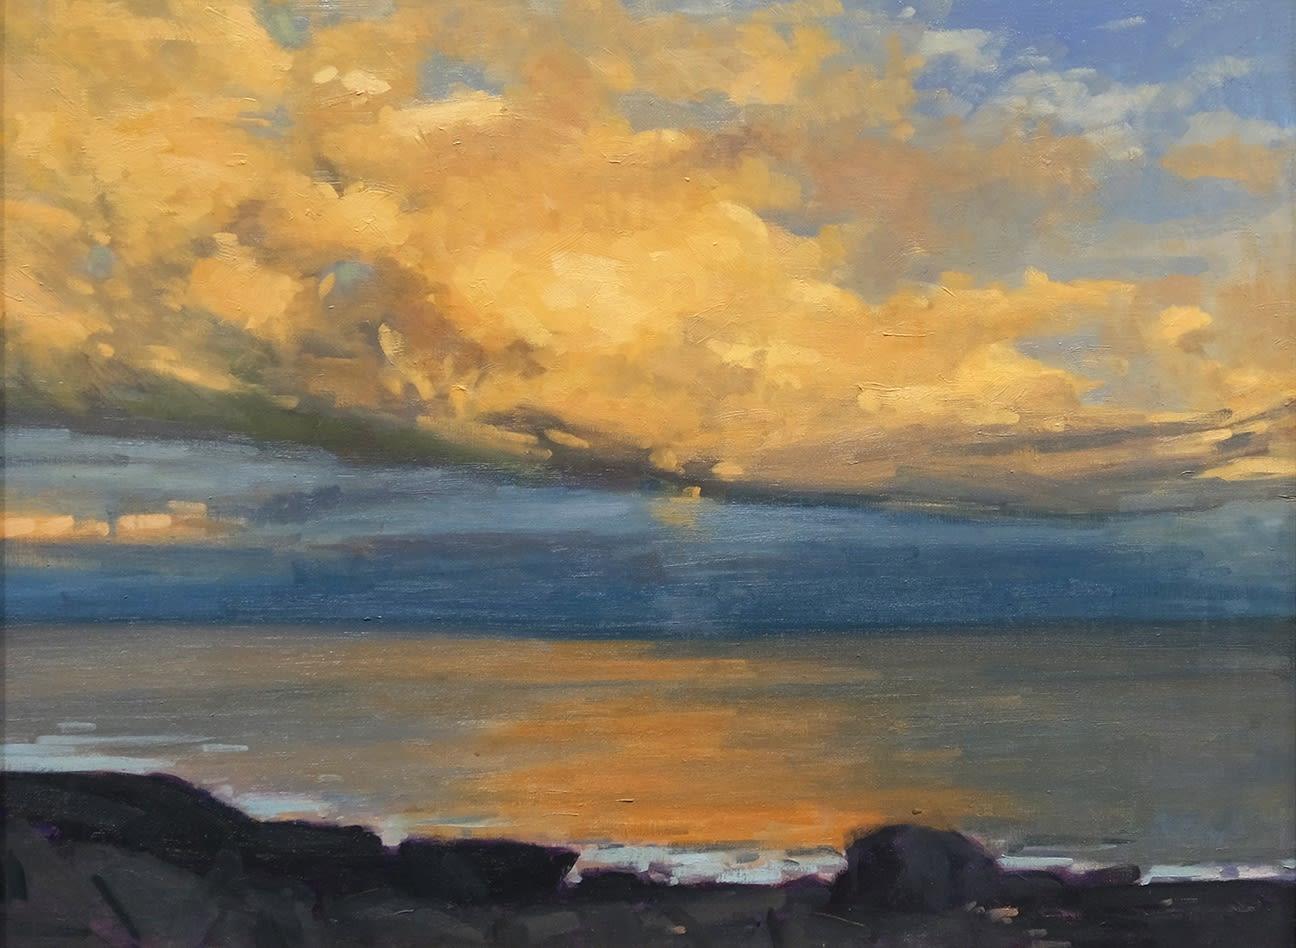 A Celebration of the Art of Monhegan Island, Alison Hill: Untamed Beauty, Richard Keen: Monhegan Abstracted plus a discu